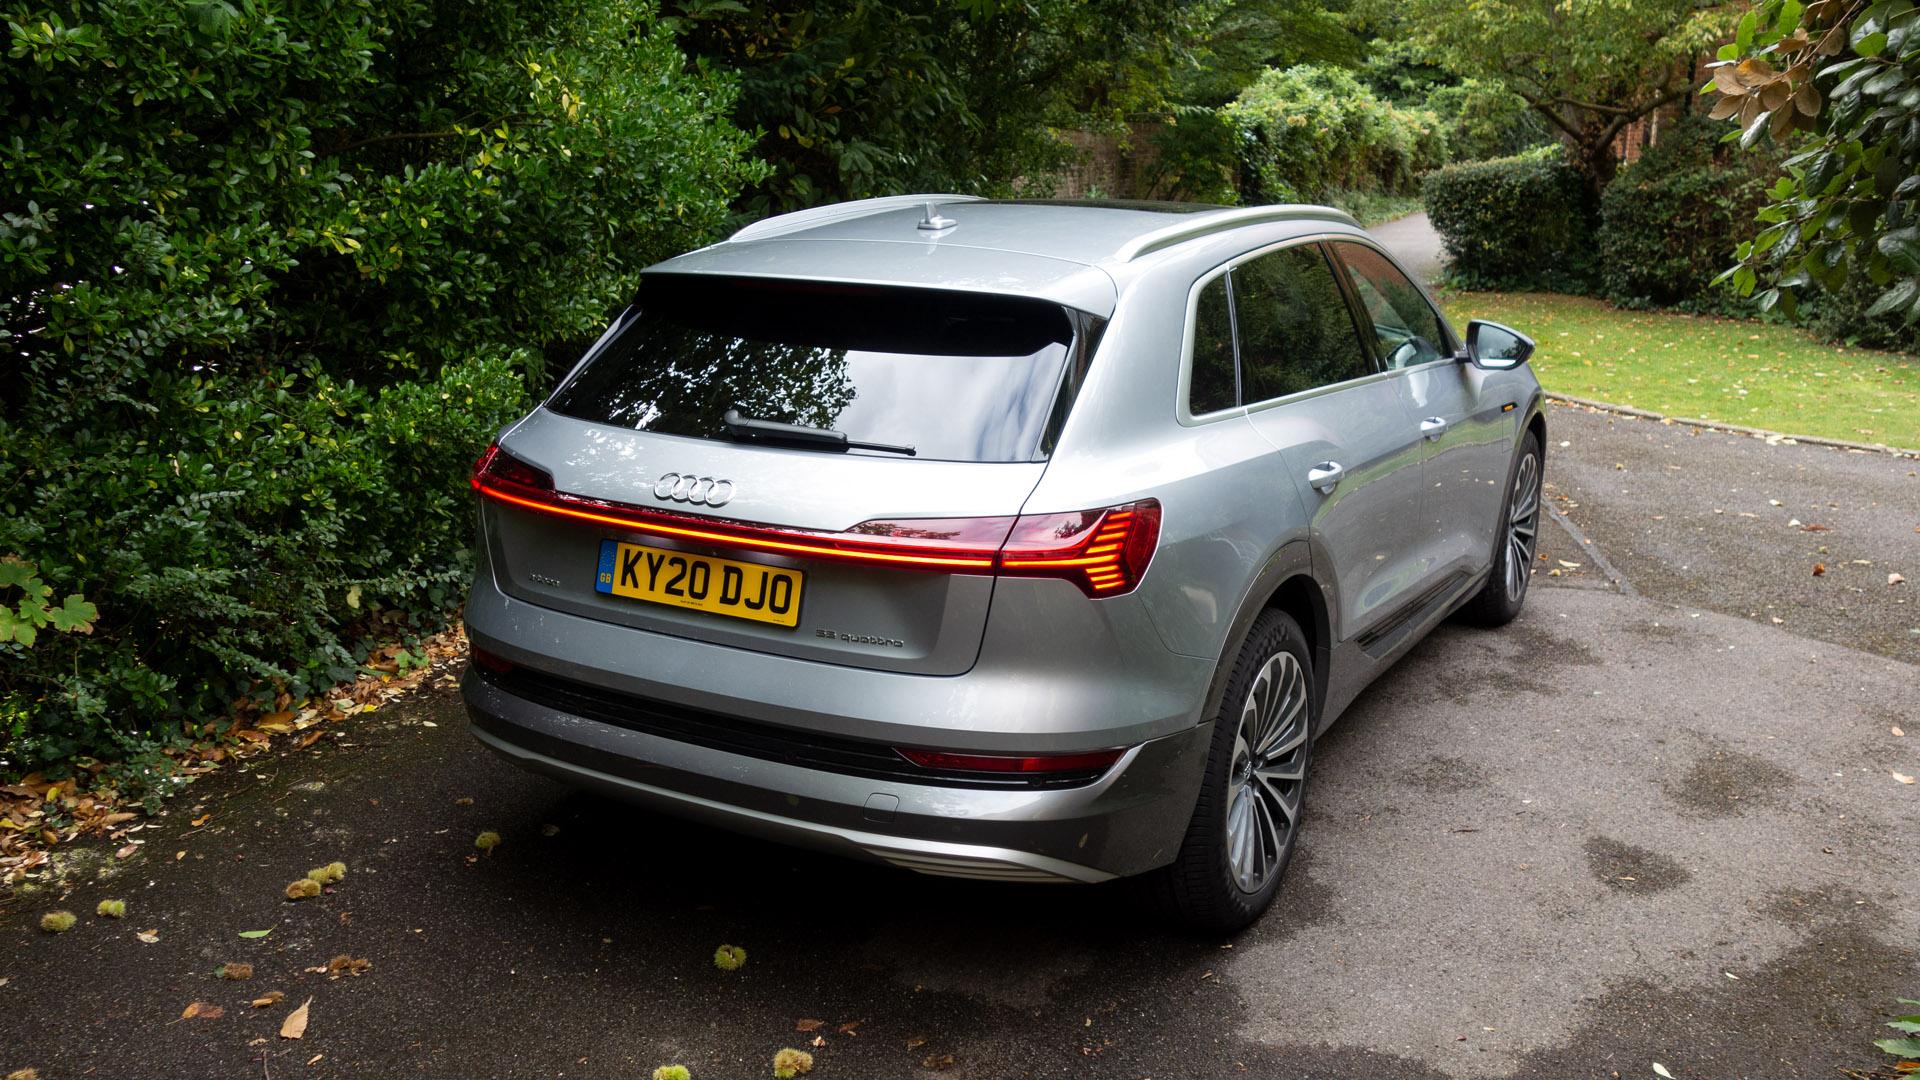 Audi e-tron rear design